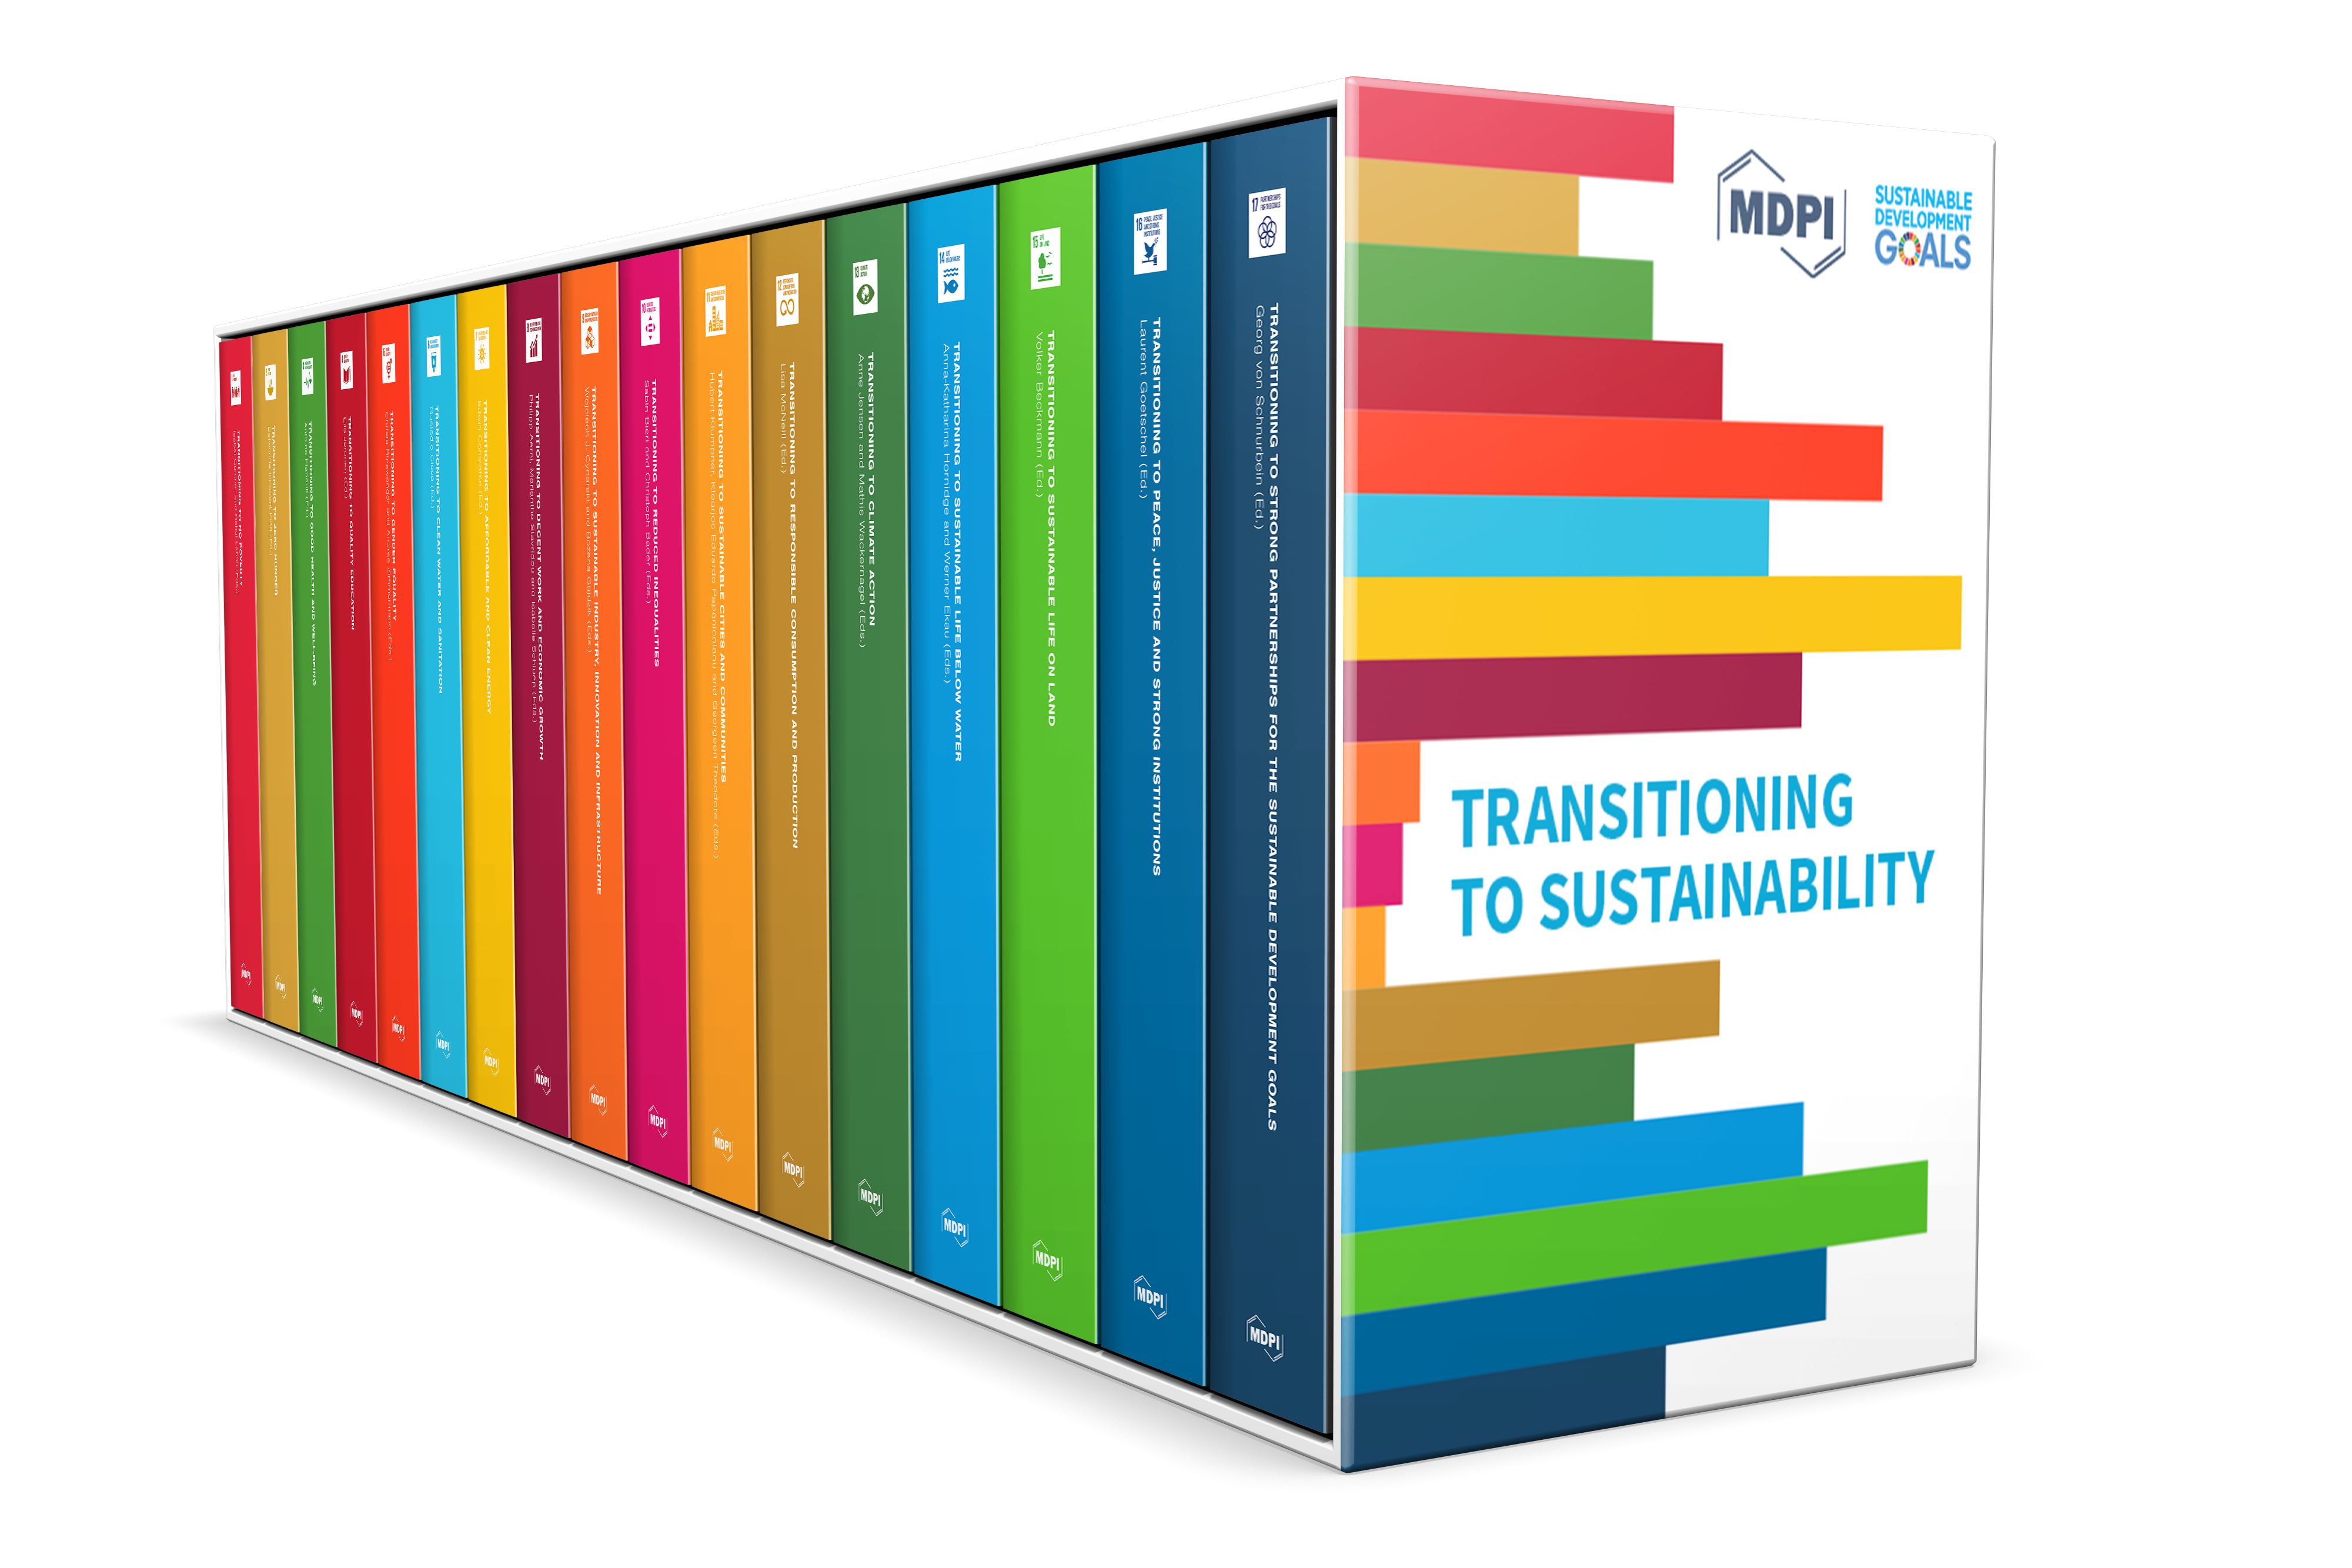 Transitioning to Sustainability